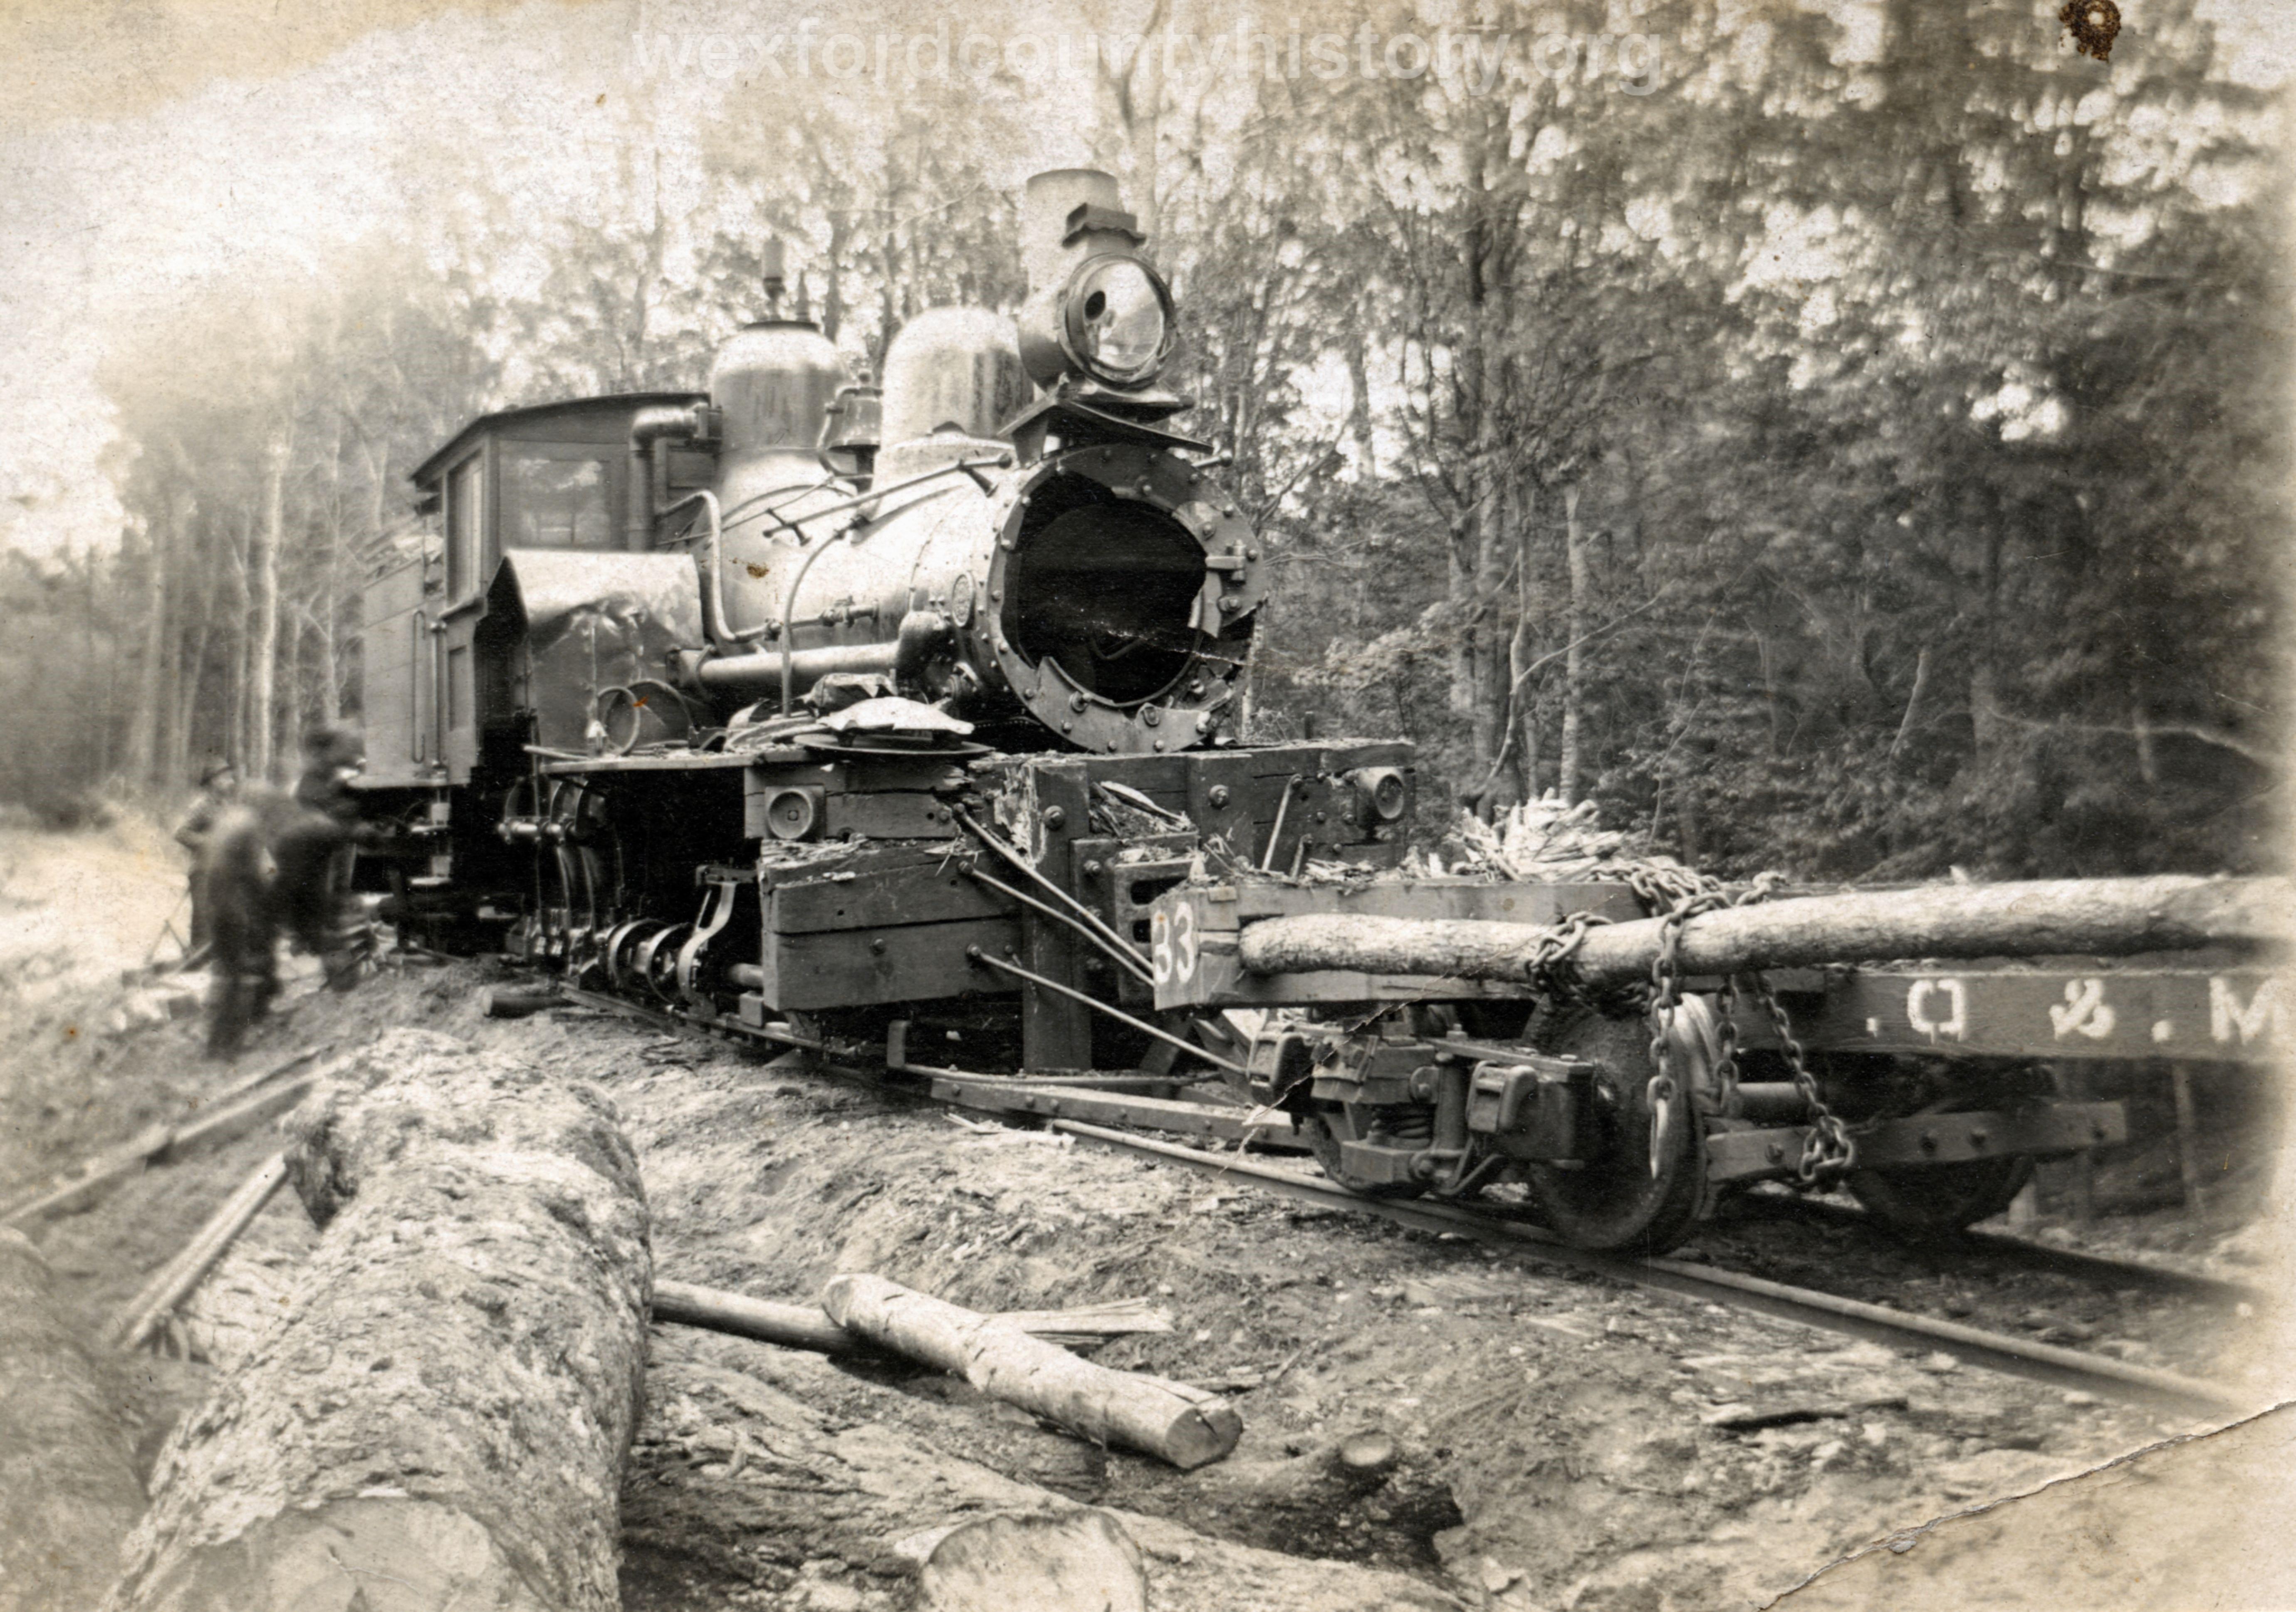 Cadillac-Lumber-Loco-5-Shay-unk-Boiler-Explosion-Wexford-Mus